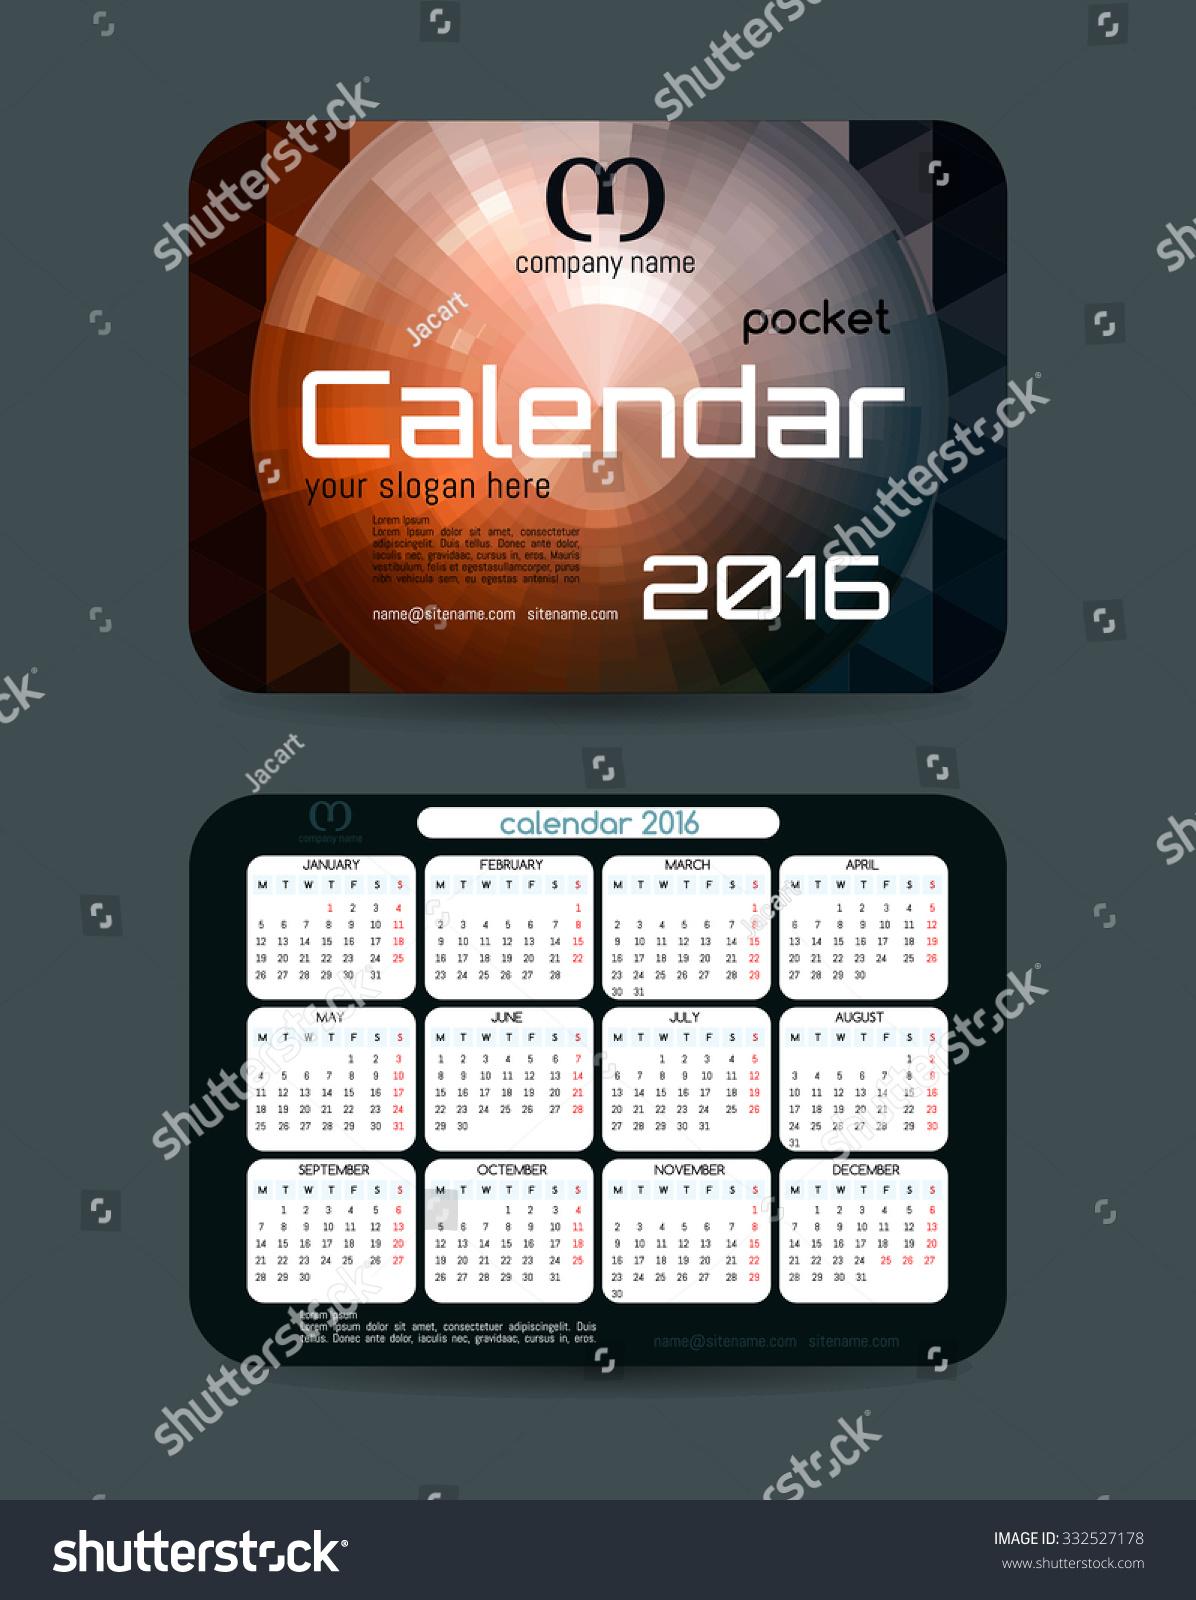 Design Pocket Calendar 2016. Vector Templates All Months. Example ...